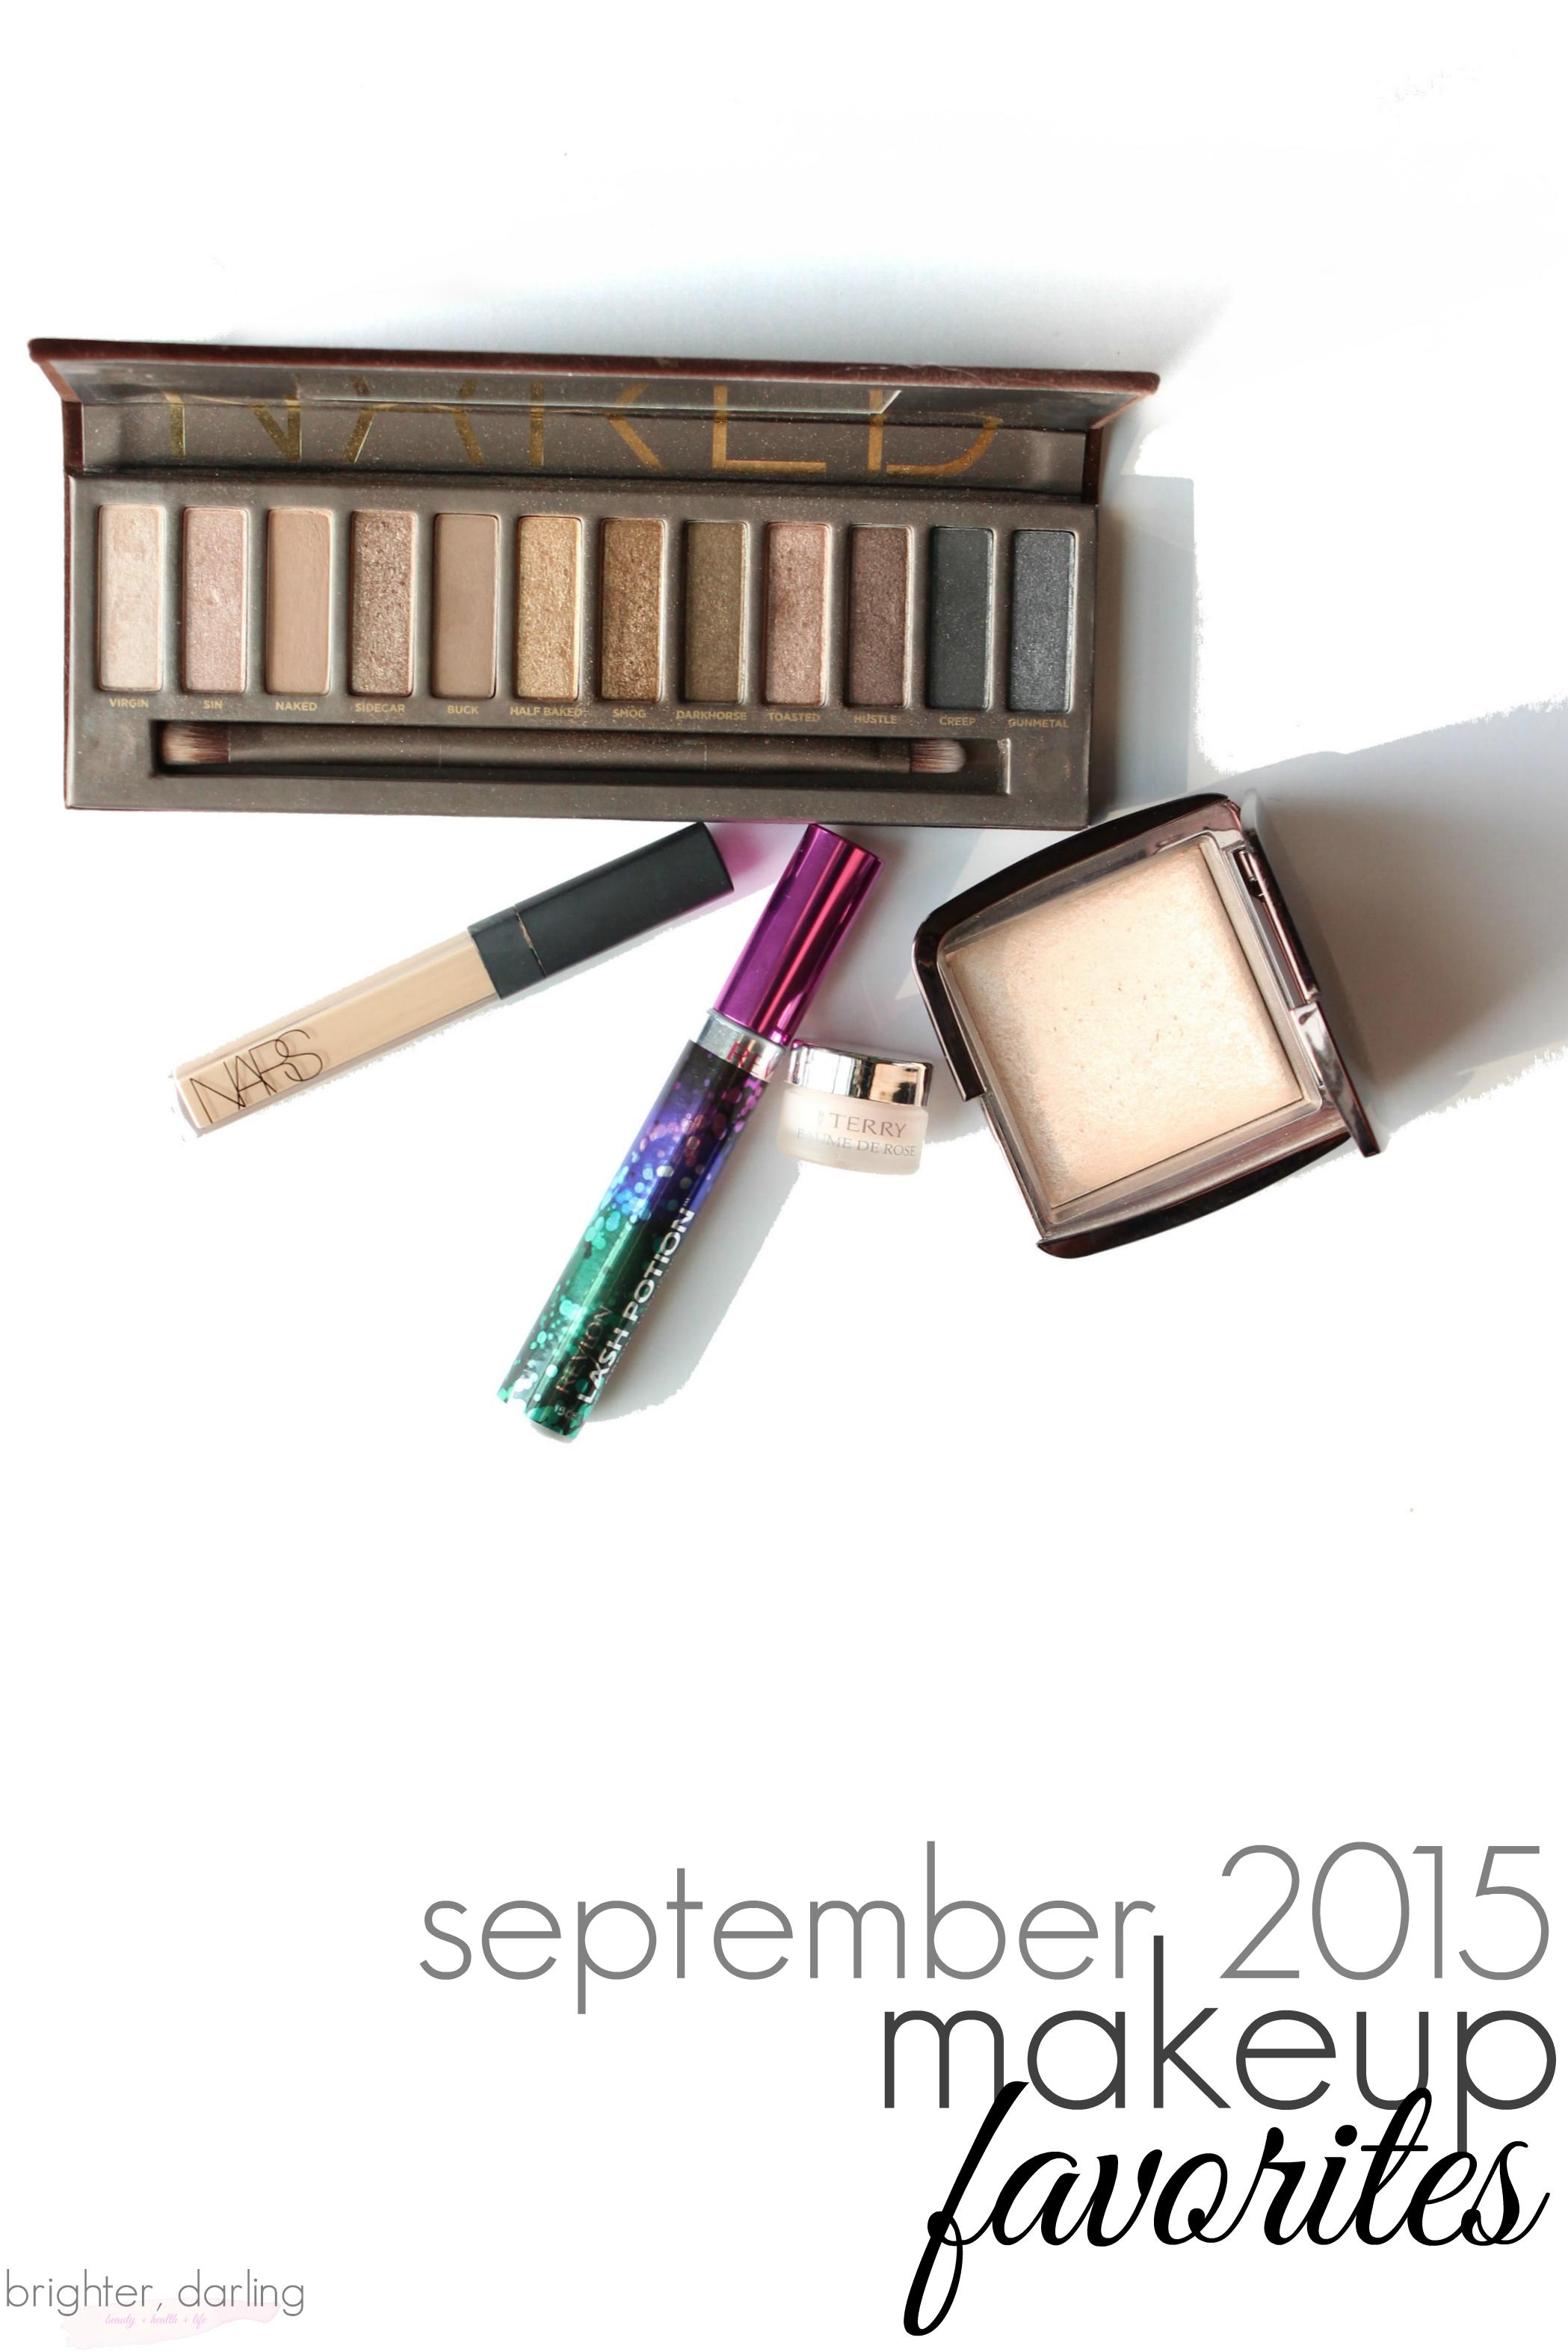 September 2015 Makeup Beauty Favorites Urban Decay Naked NARS Radiant Custard Revlon Lash Potion byTerry Hourglass Luminous Light